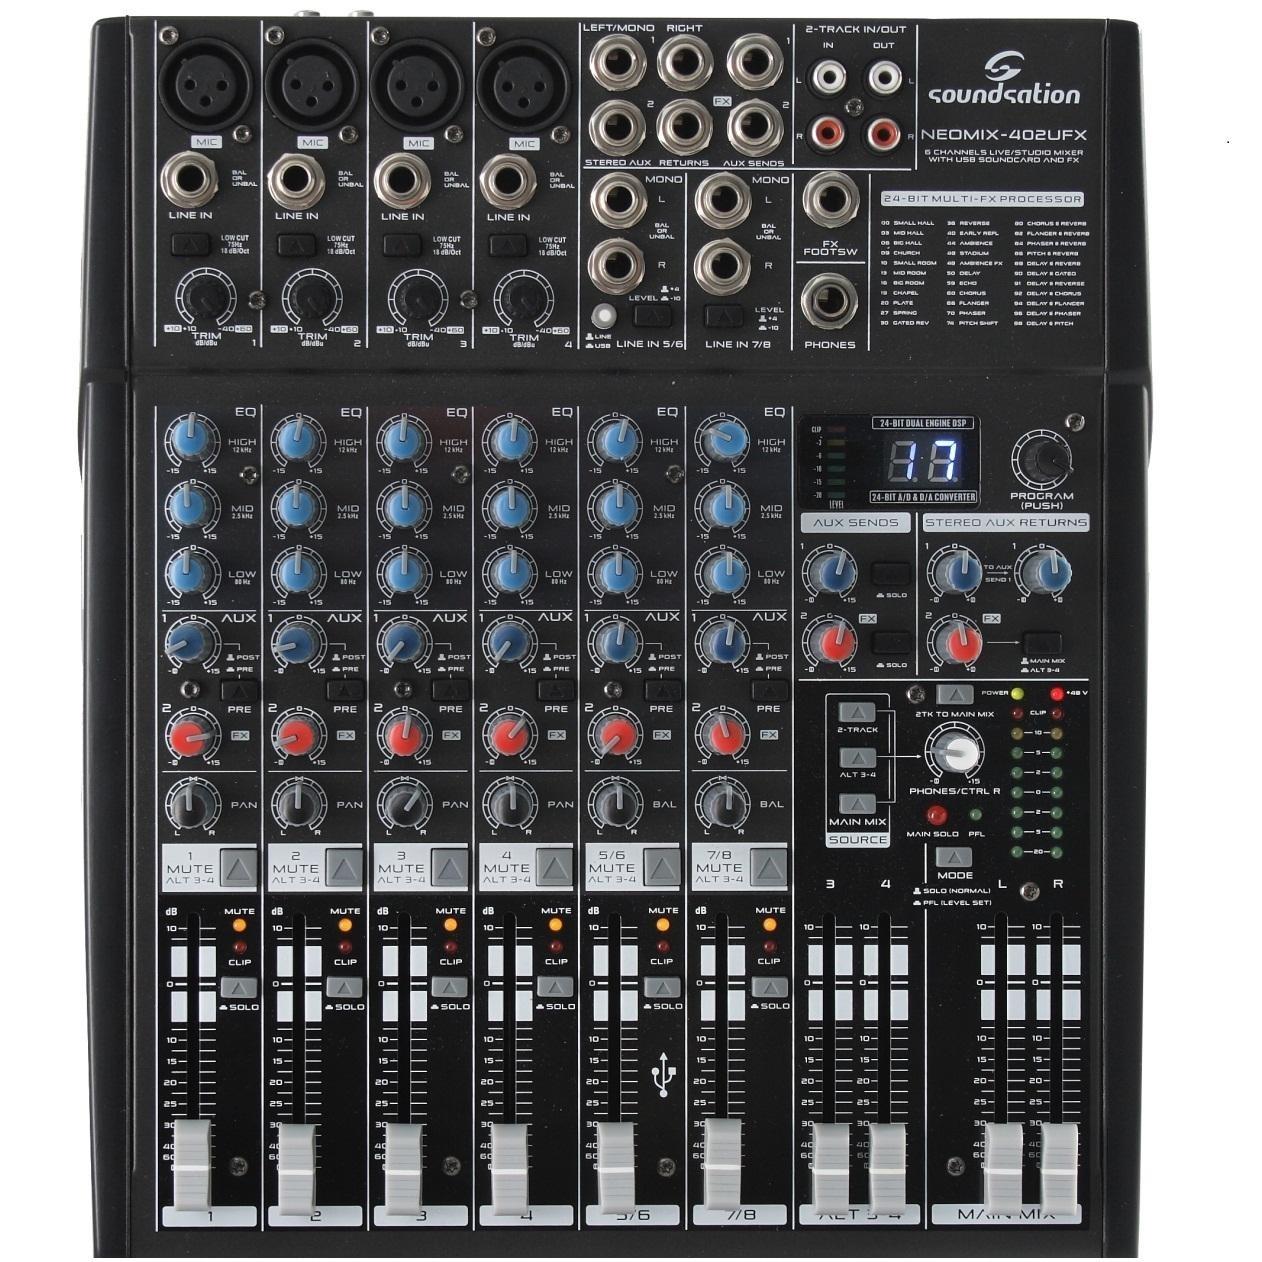 Soundsation NEOMIX 402UFX